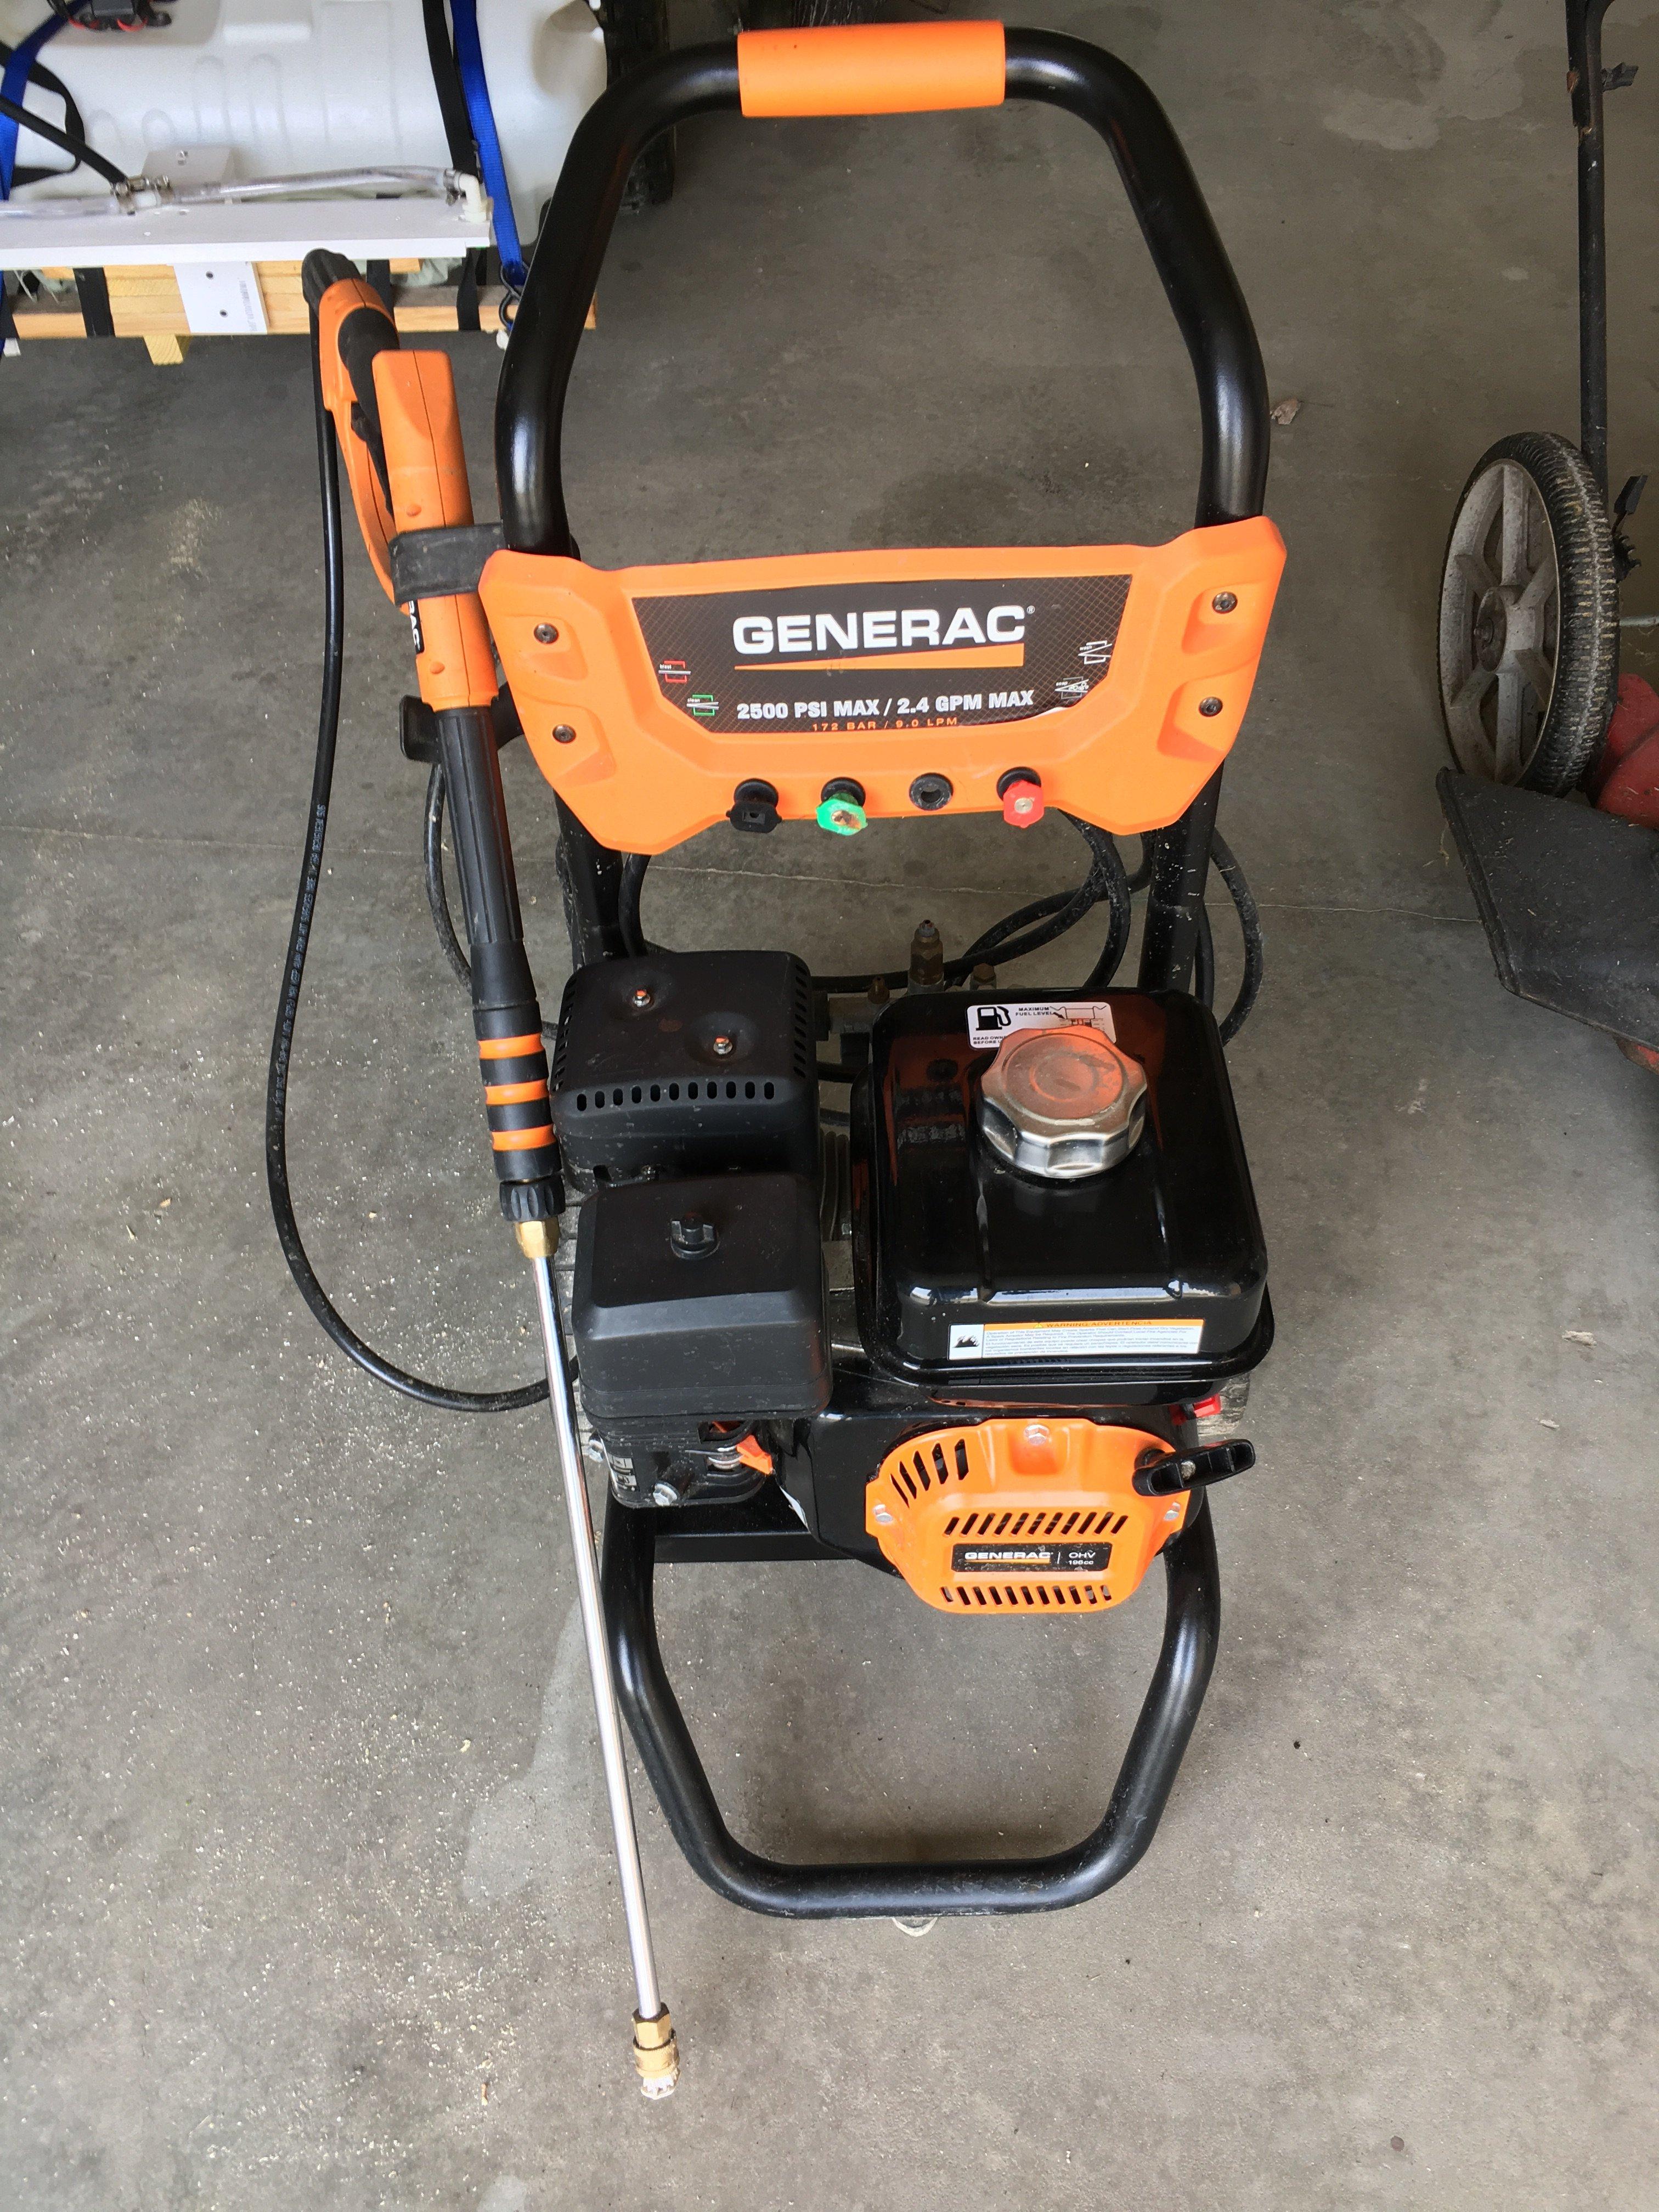 Generac power washer | Michigan Sportsman - Online Michigan